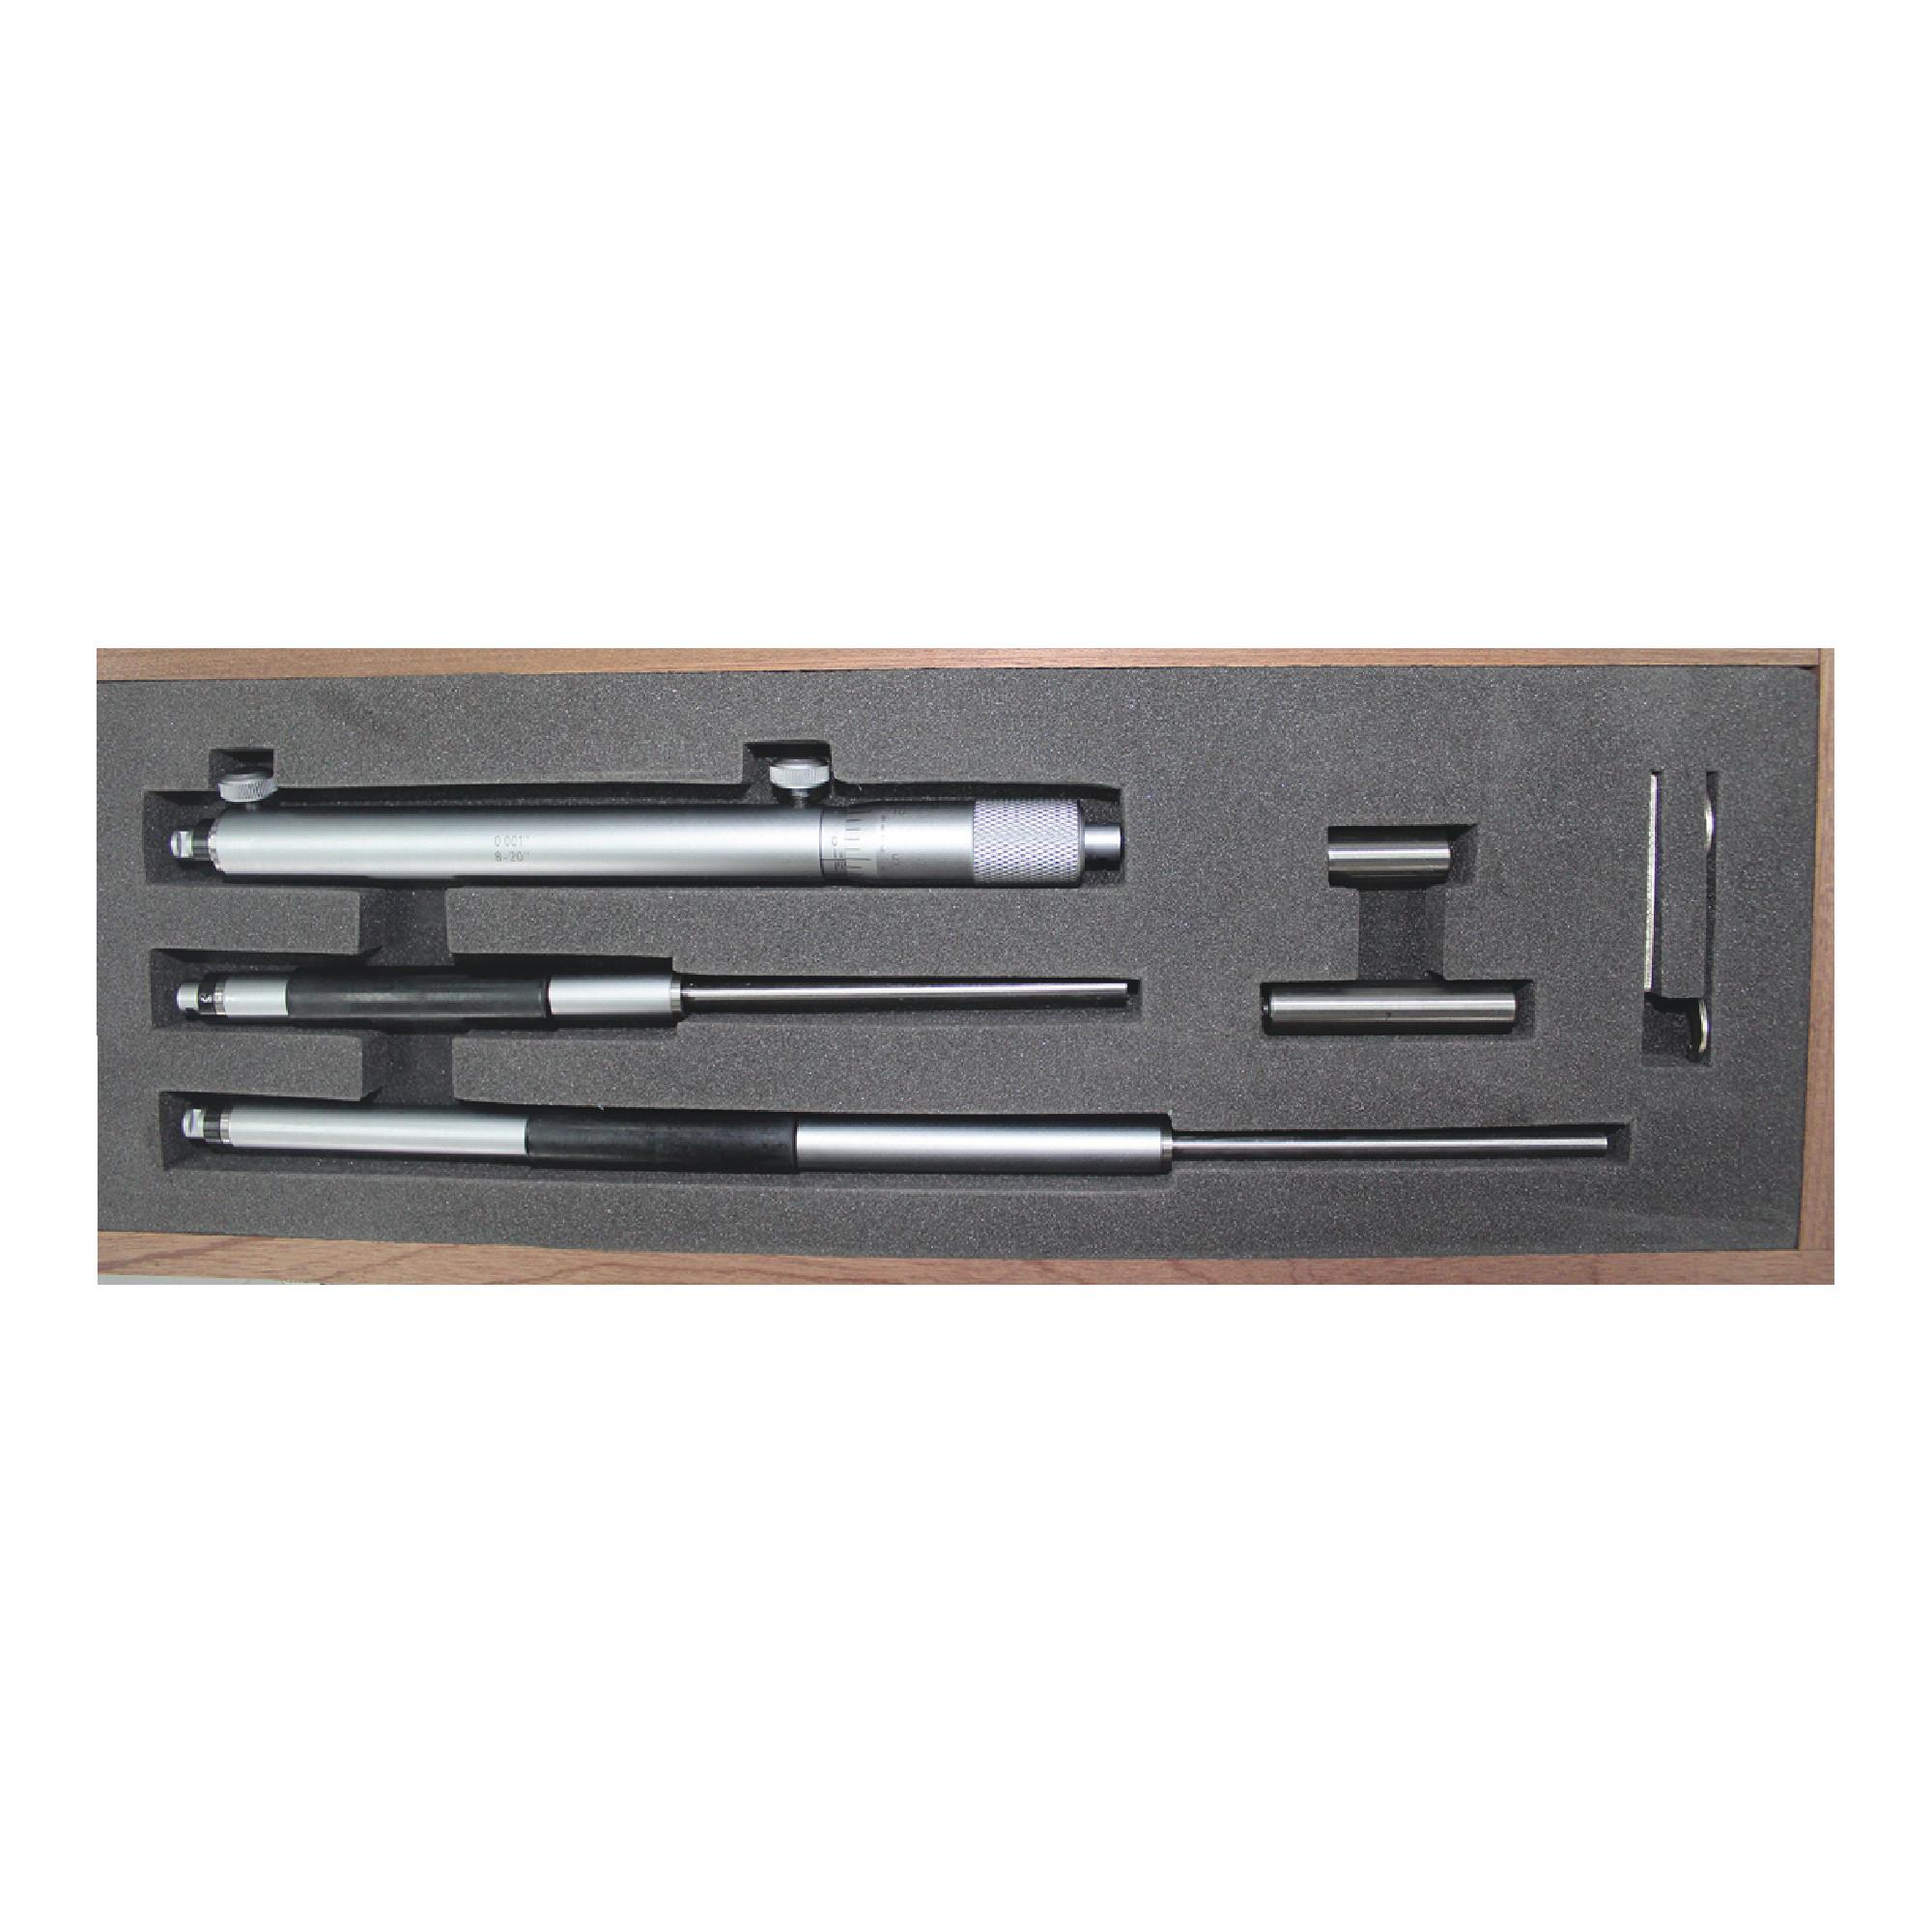 "8 ~ 20"" Rod Type Inside Micrometer Set"